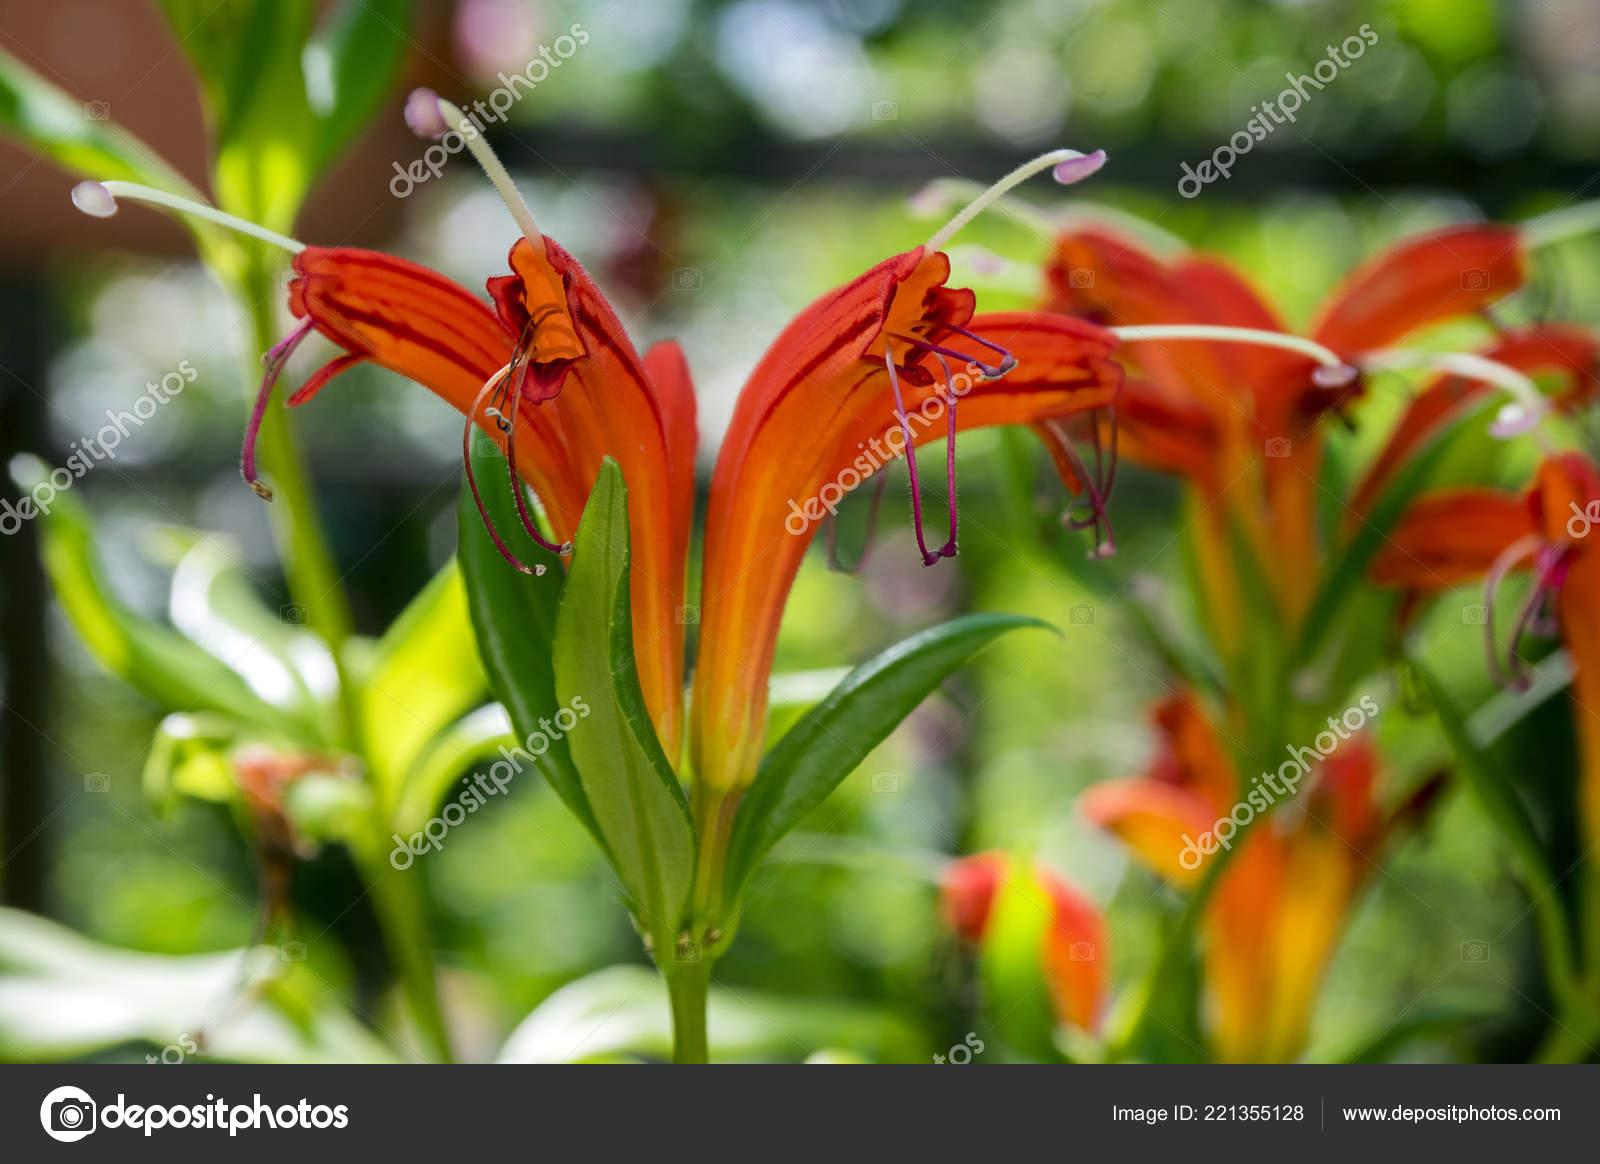 Aeschynanthus Speciosus Bloom Pretty Orange Red Flowers Ornamental